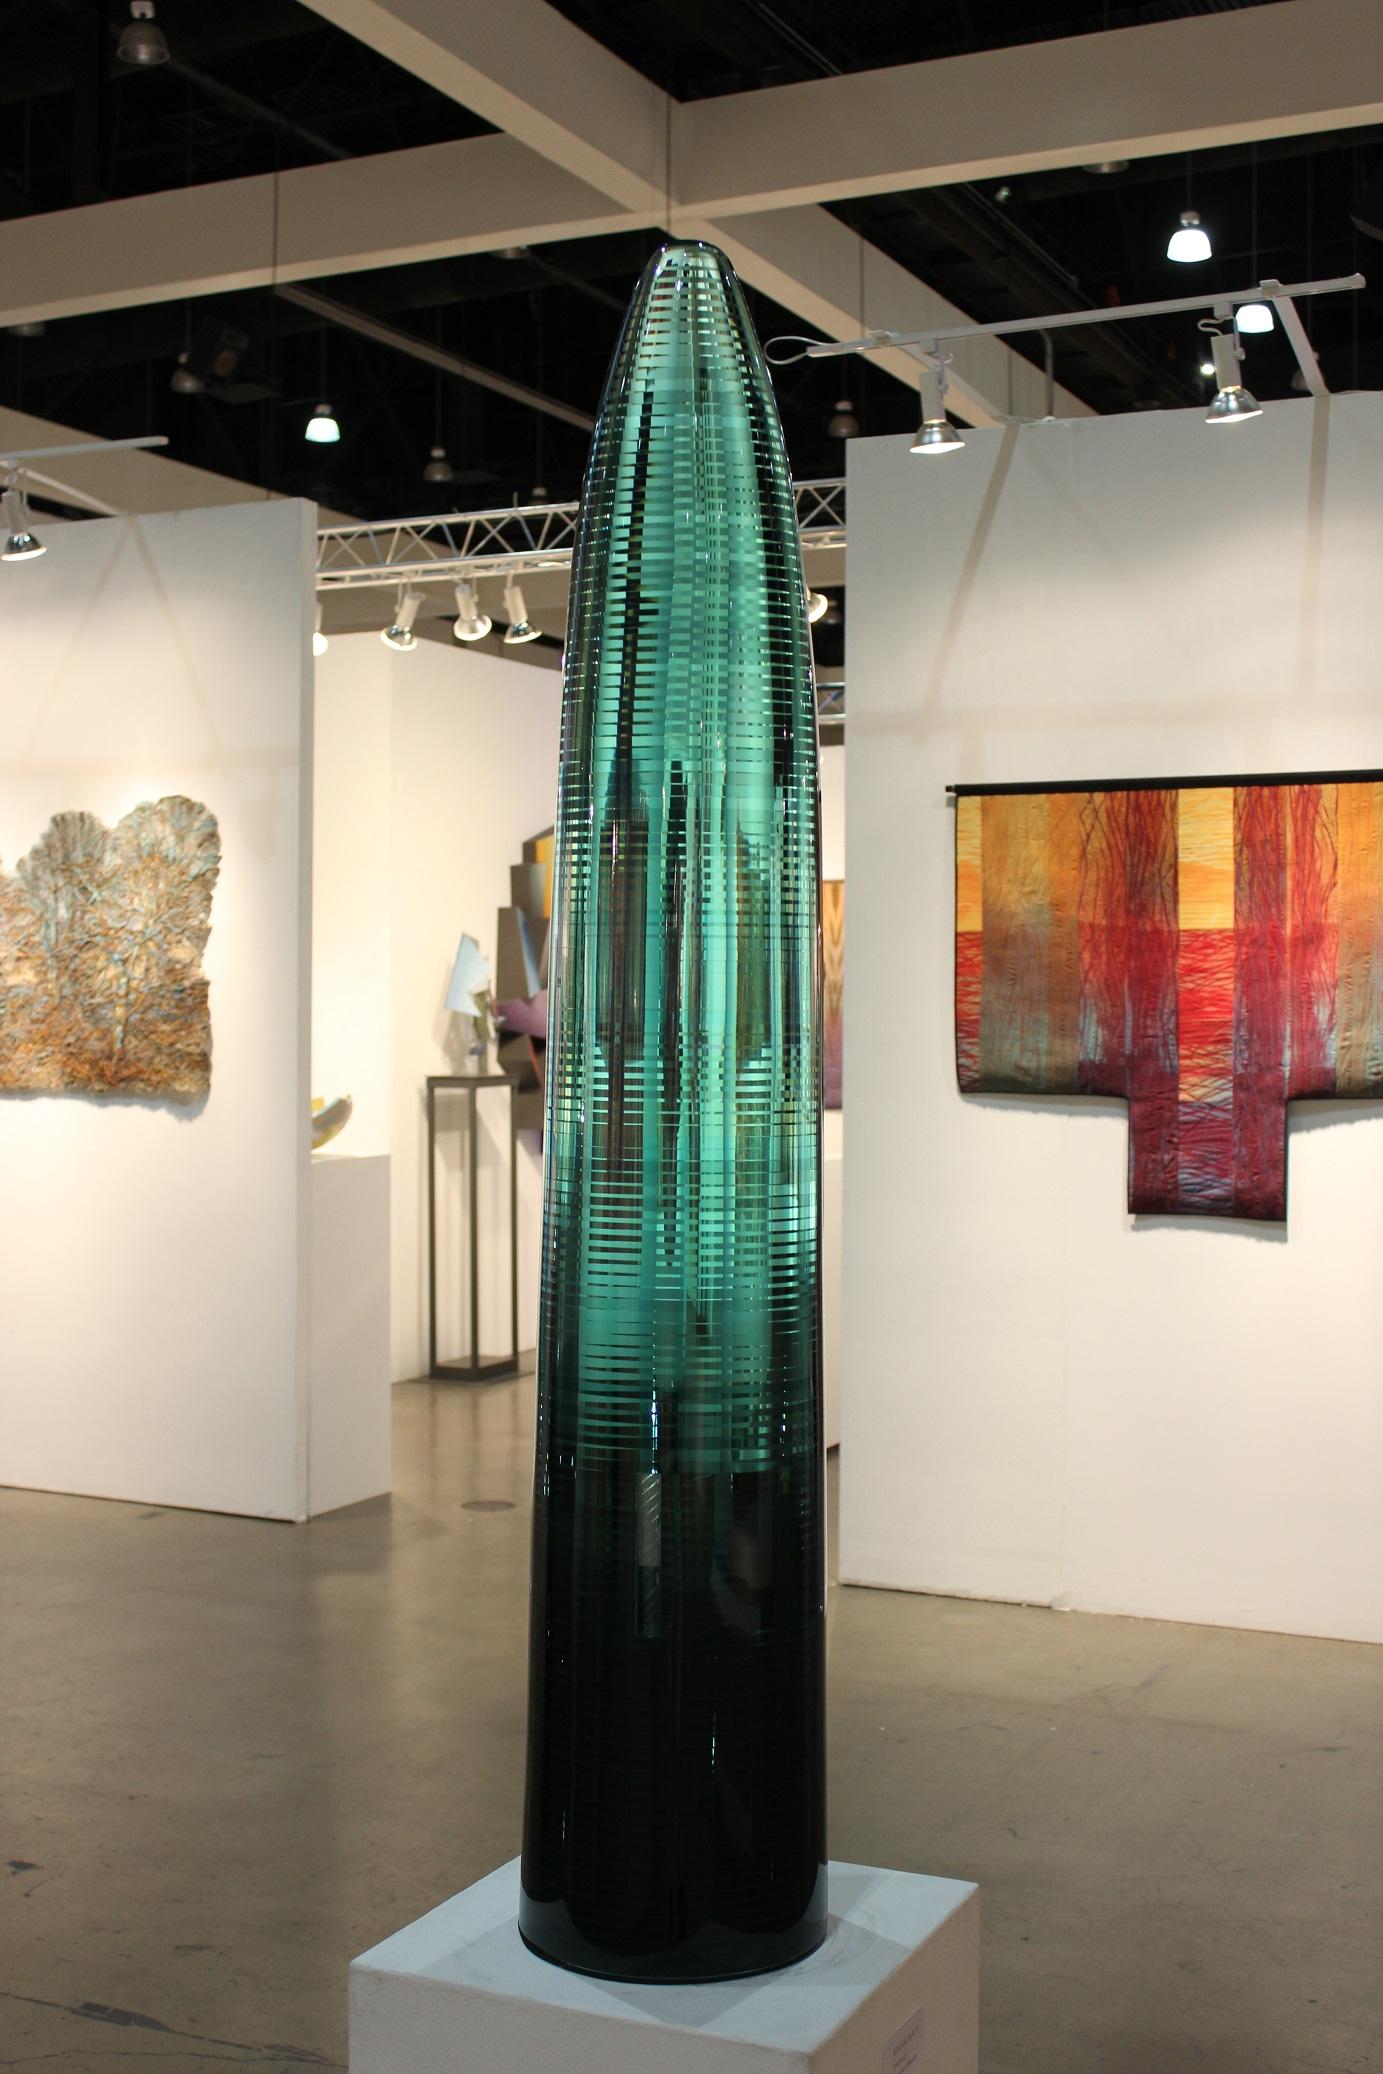 Knupp gallery la at the la art show 2016 knupp gallery la for Craft shows in louisiana